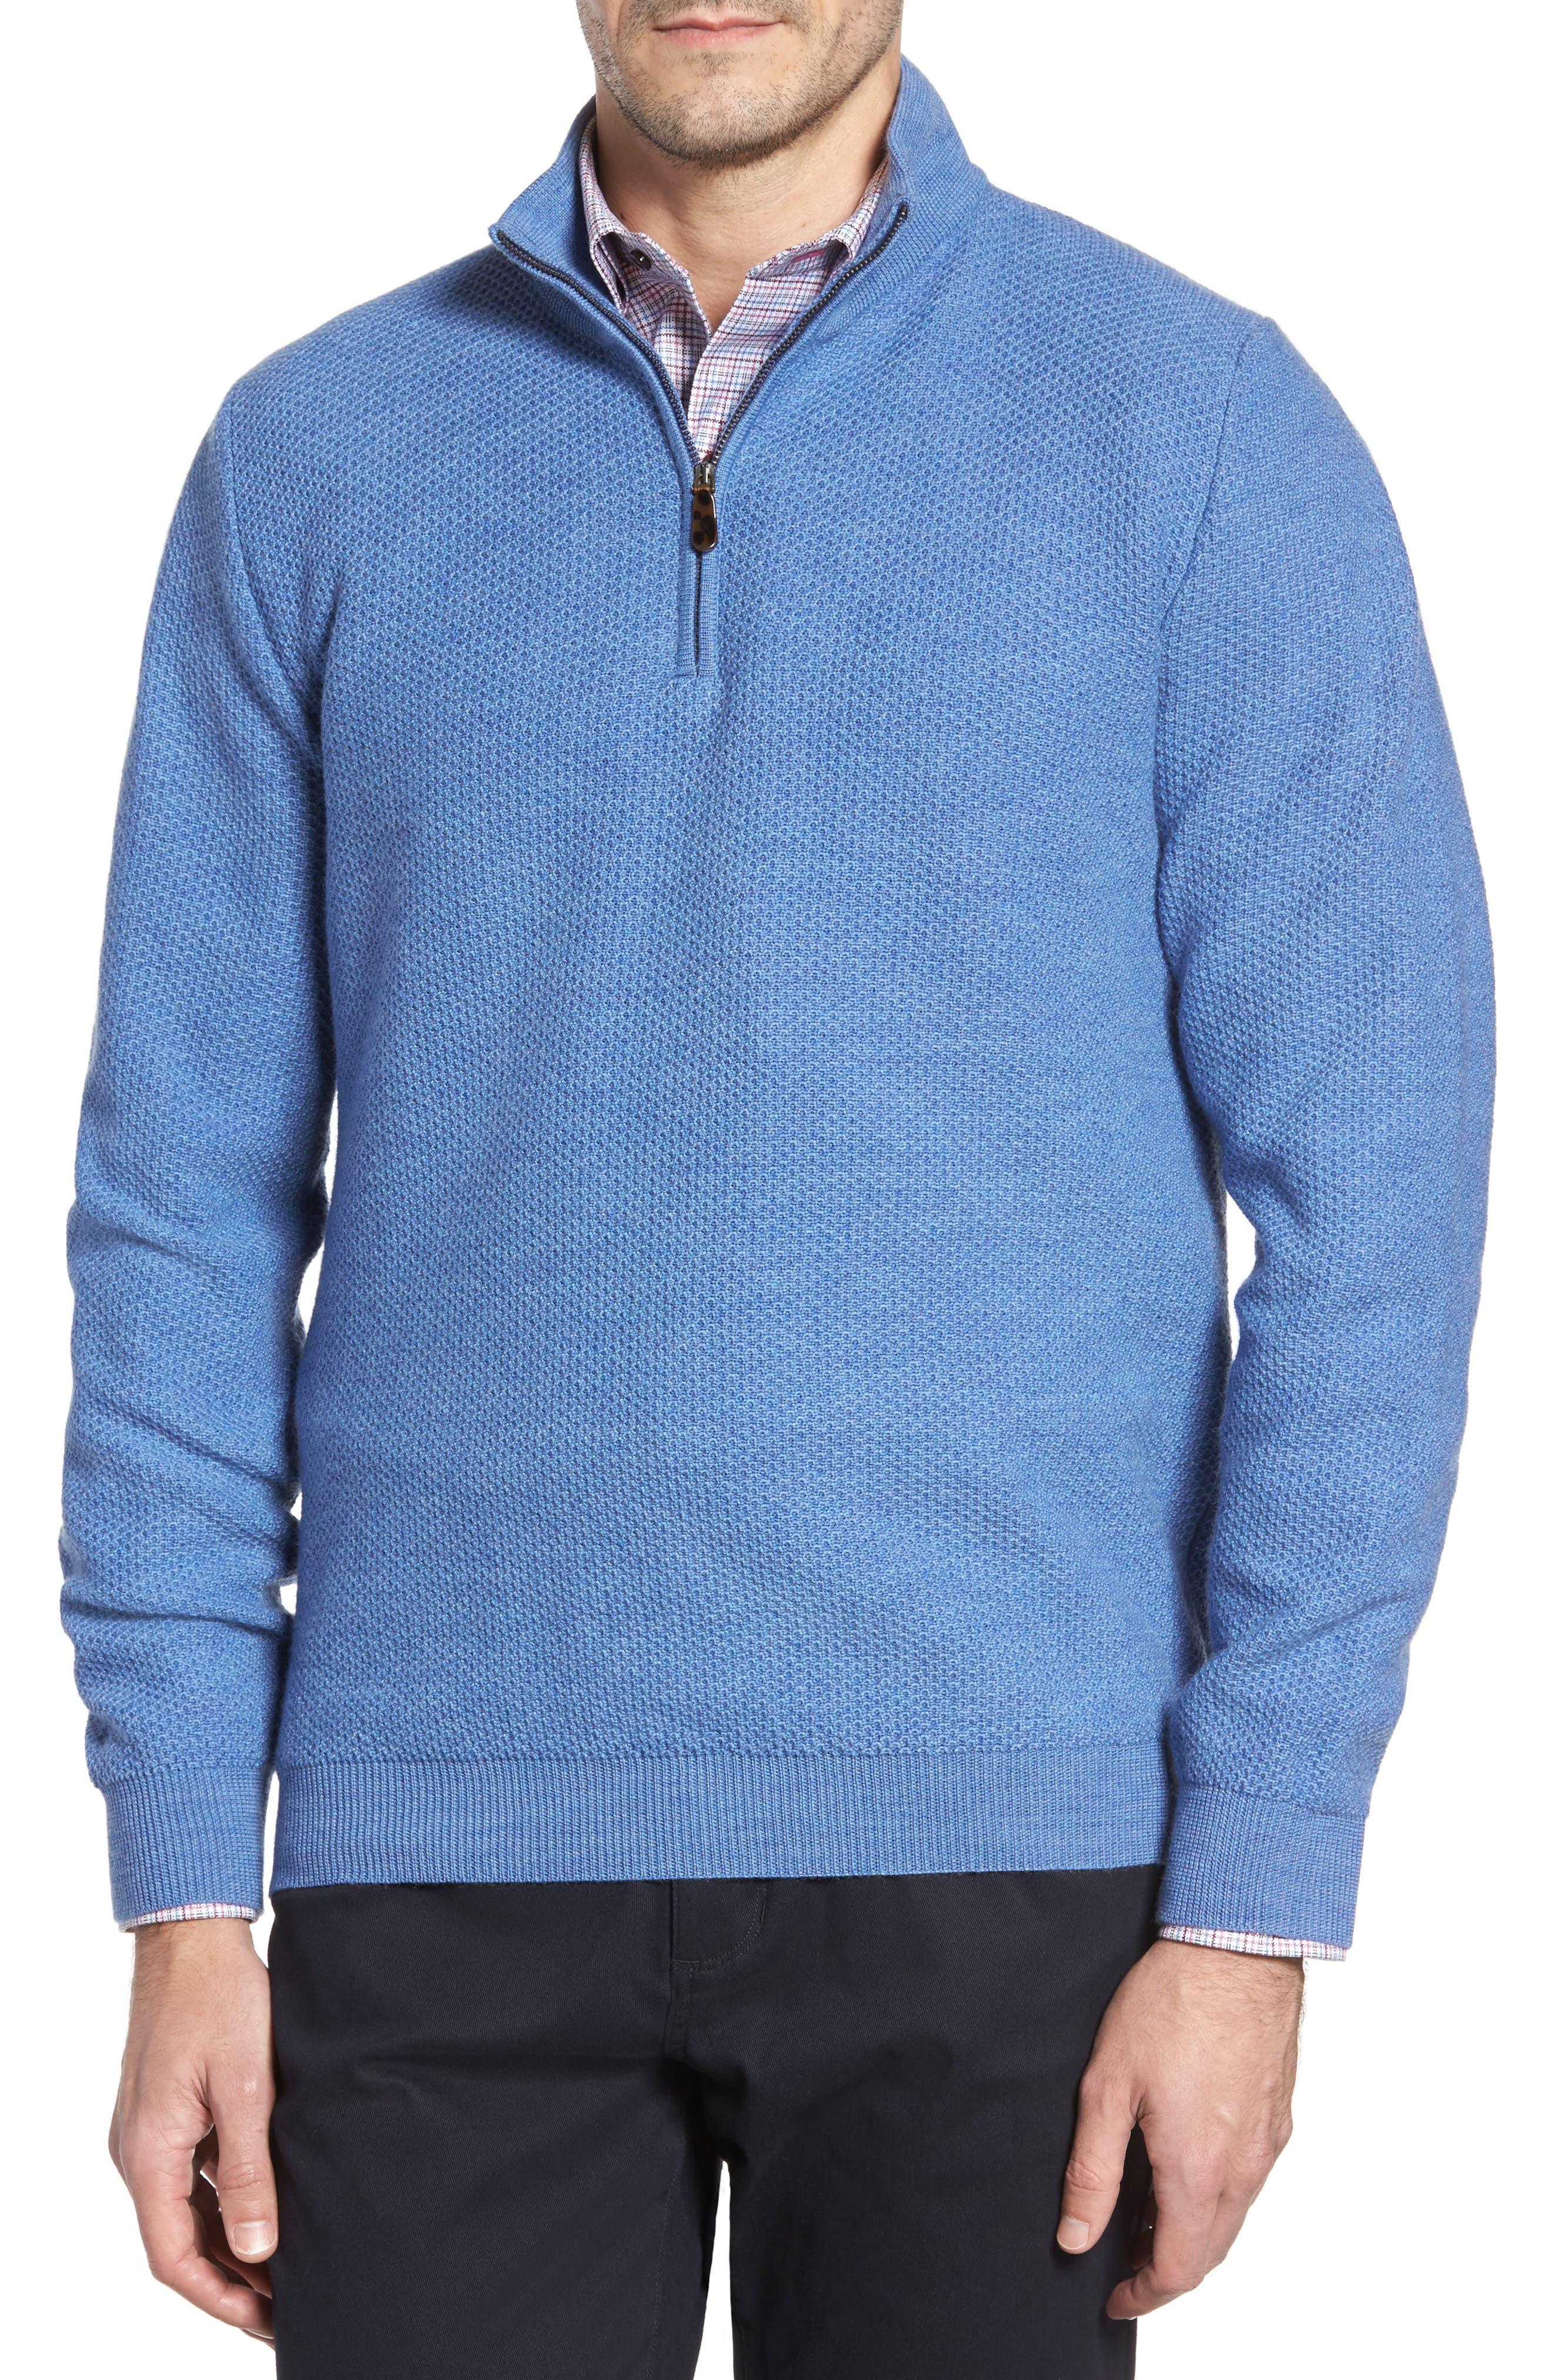 Alternate Image 1 Selected - David Donahue Honeycomb Merino Wool Quarter Zip Pullover